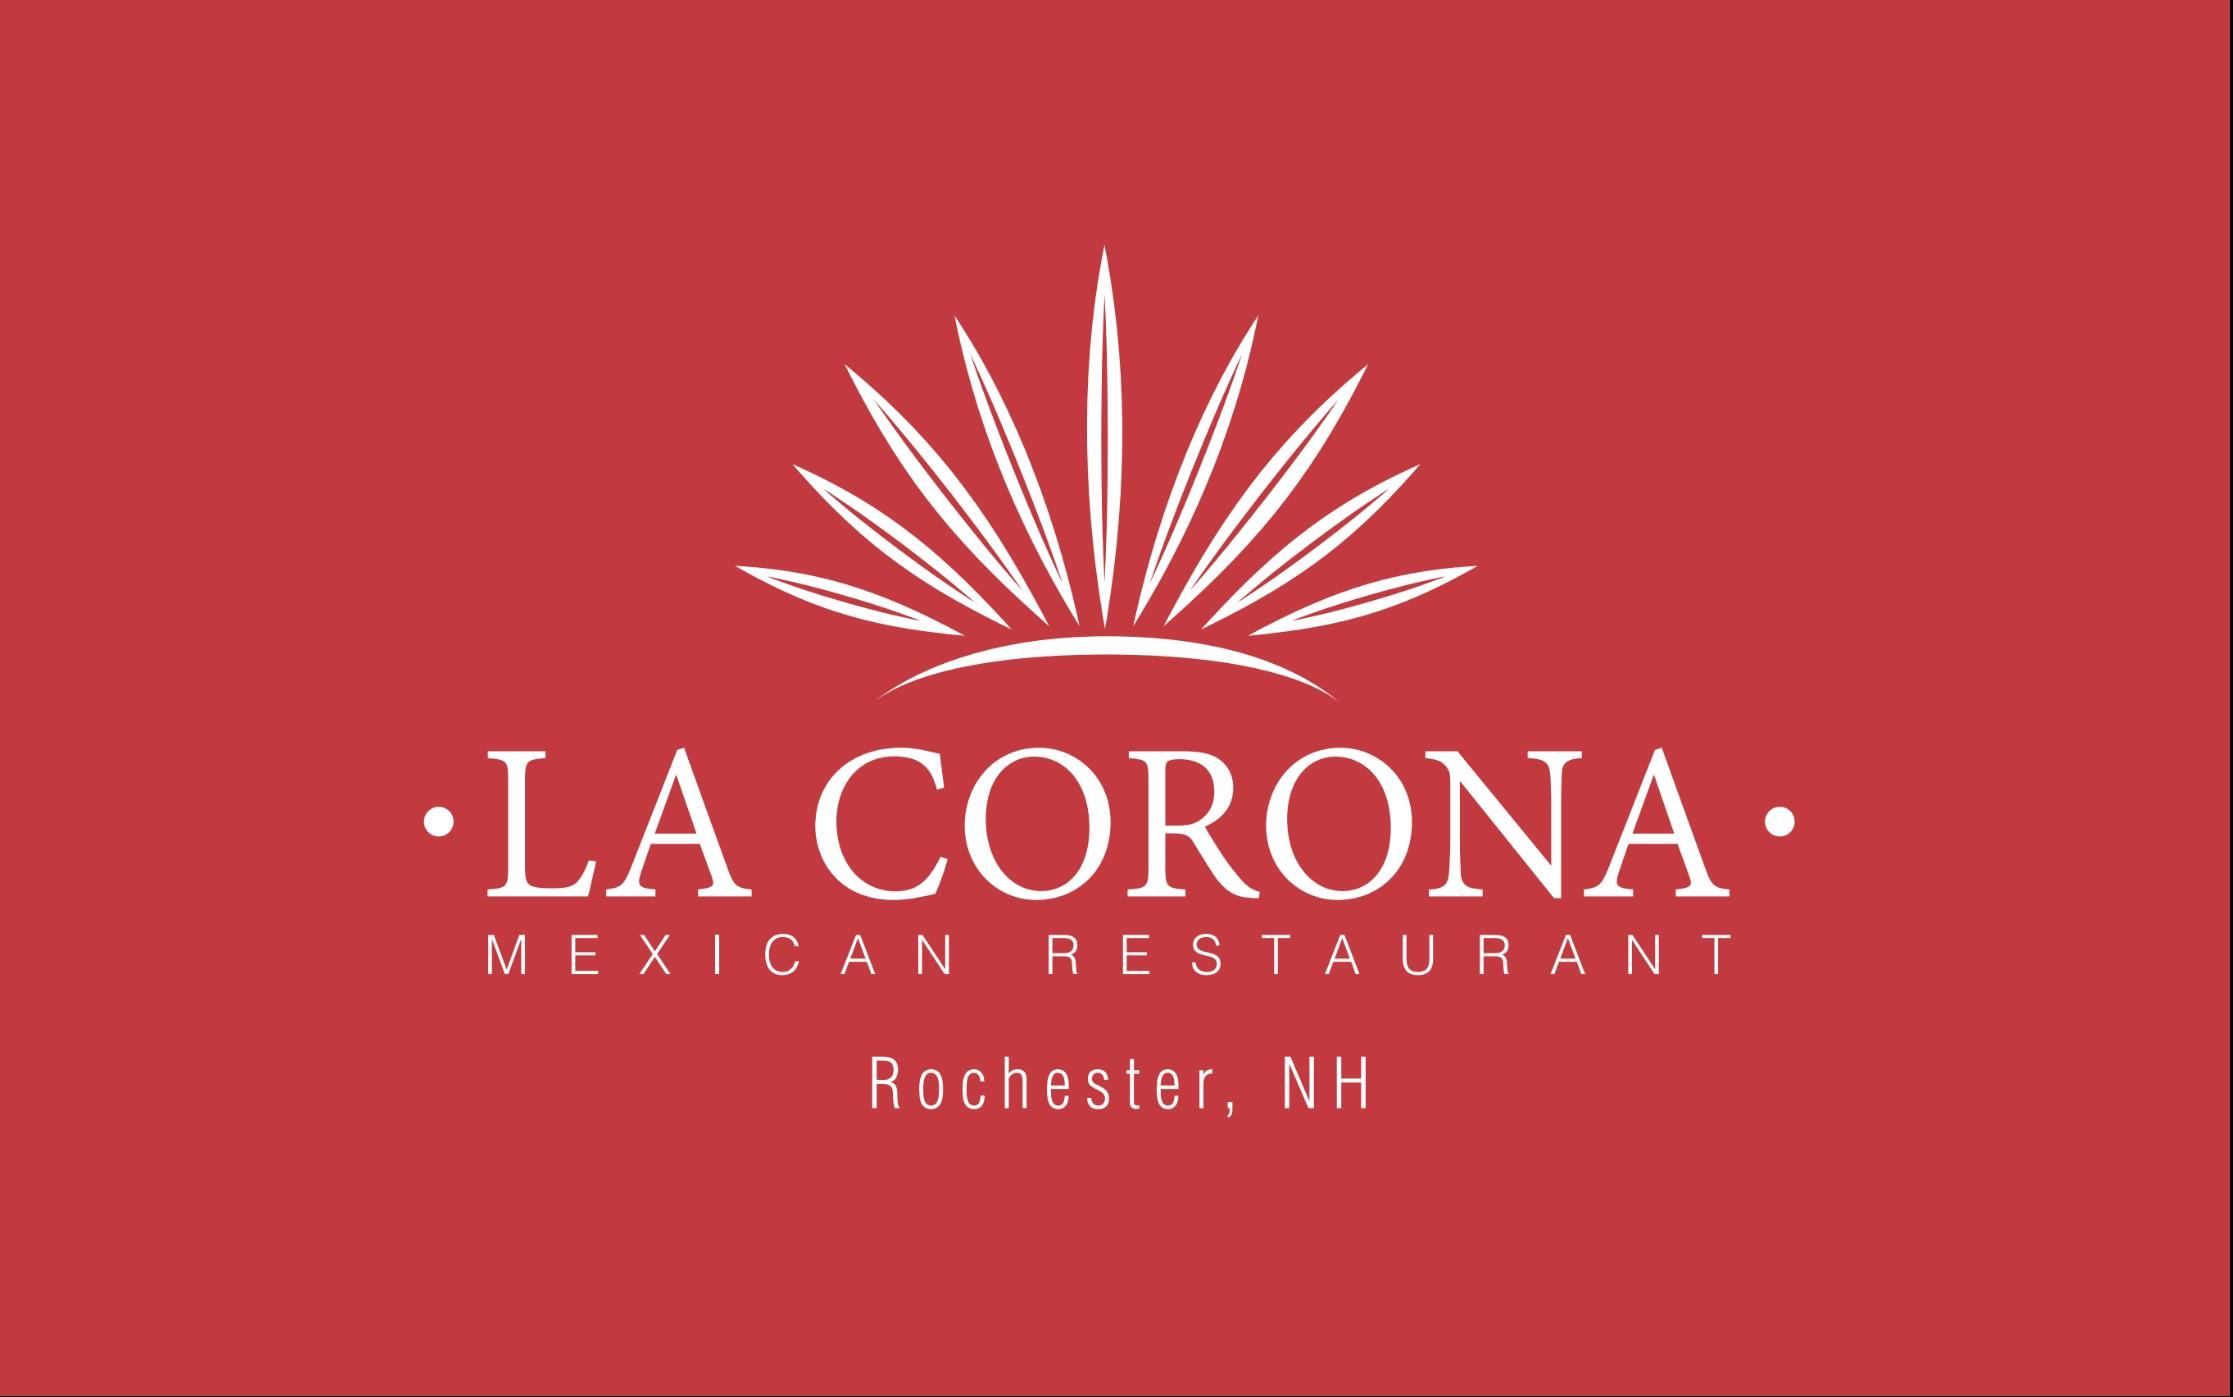 La Corona Mexican Restaurant Logo 2021